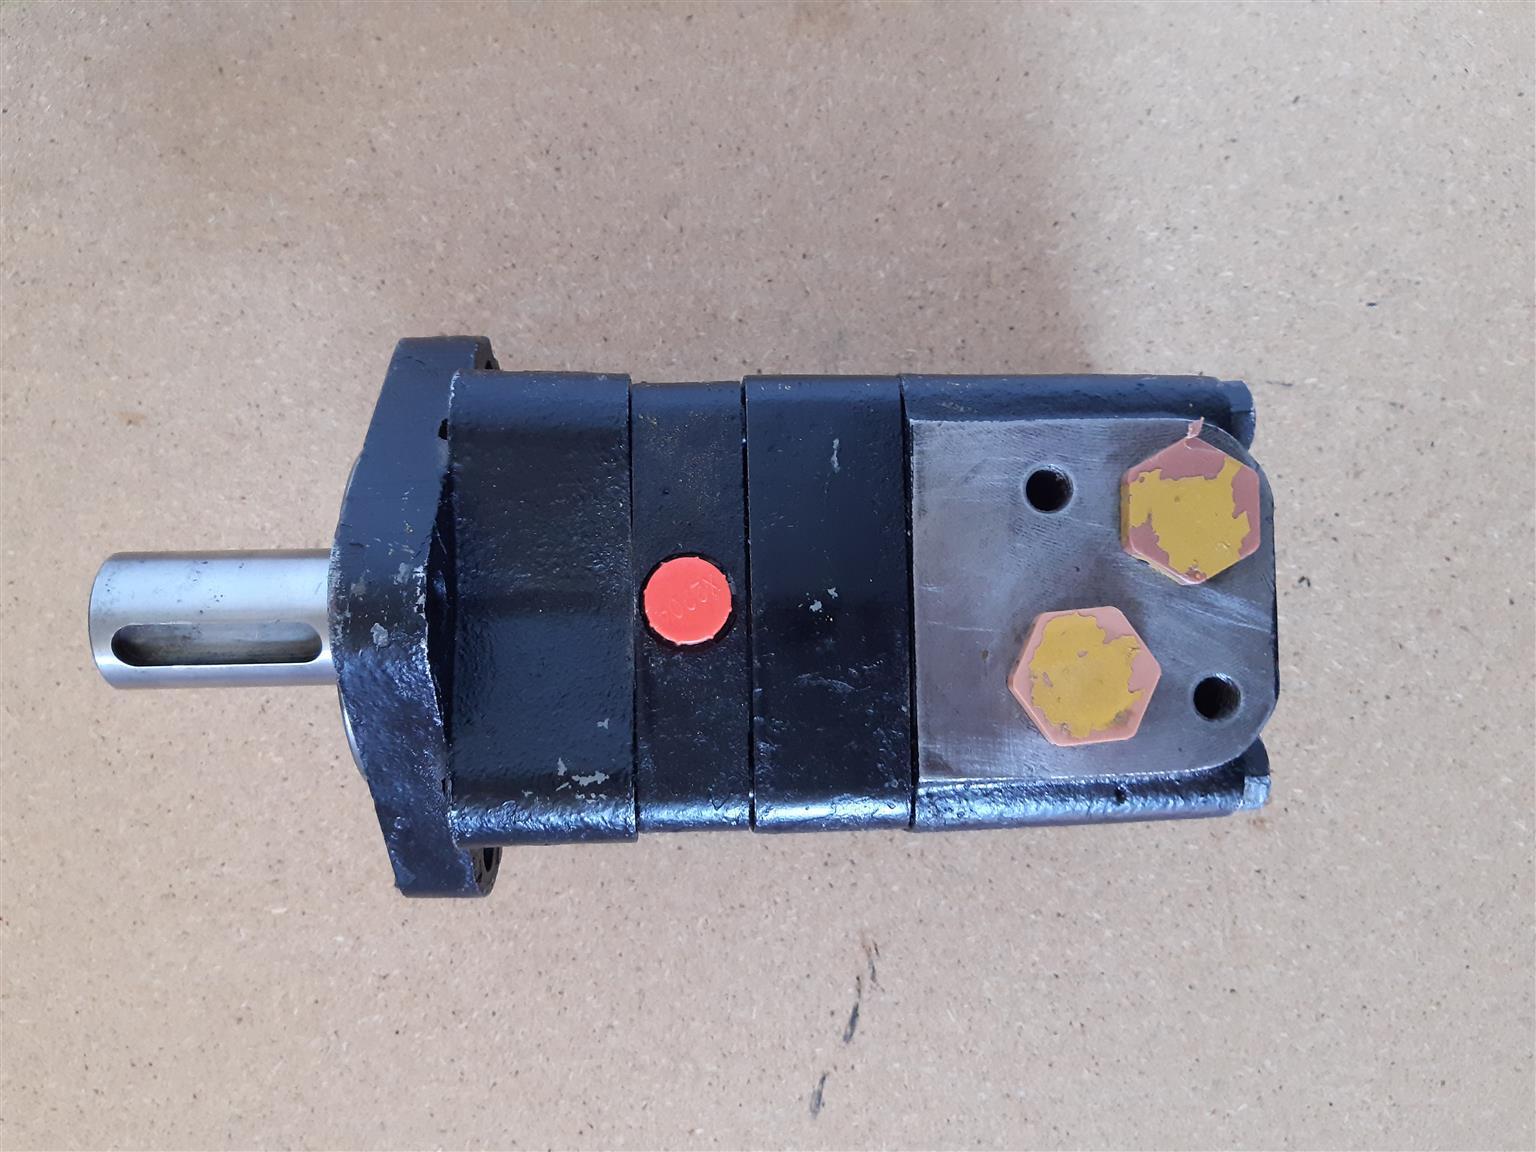 Danfoss low speed high torque hydraulic motor OMS 200 (151F0204)